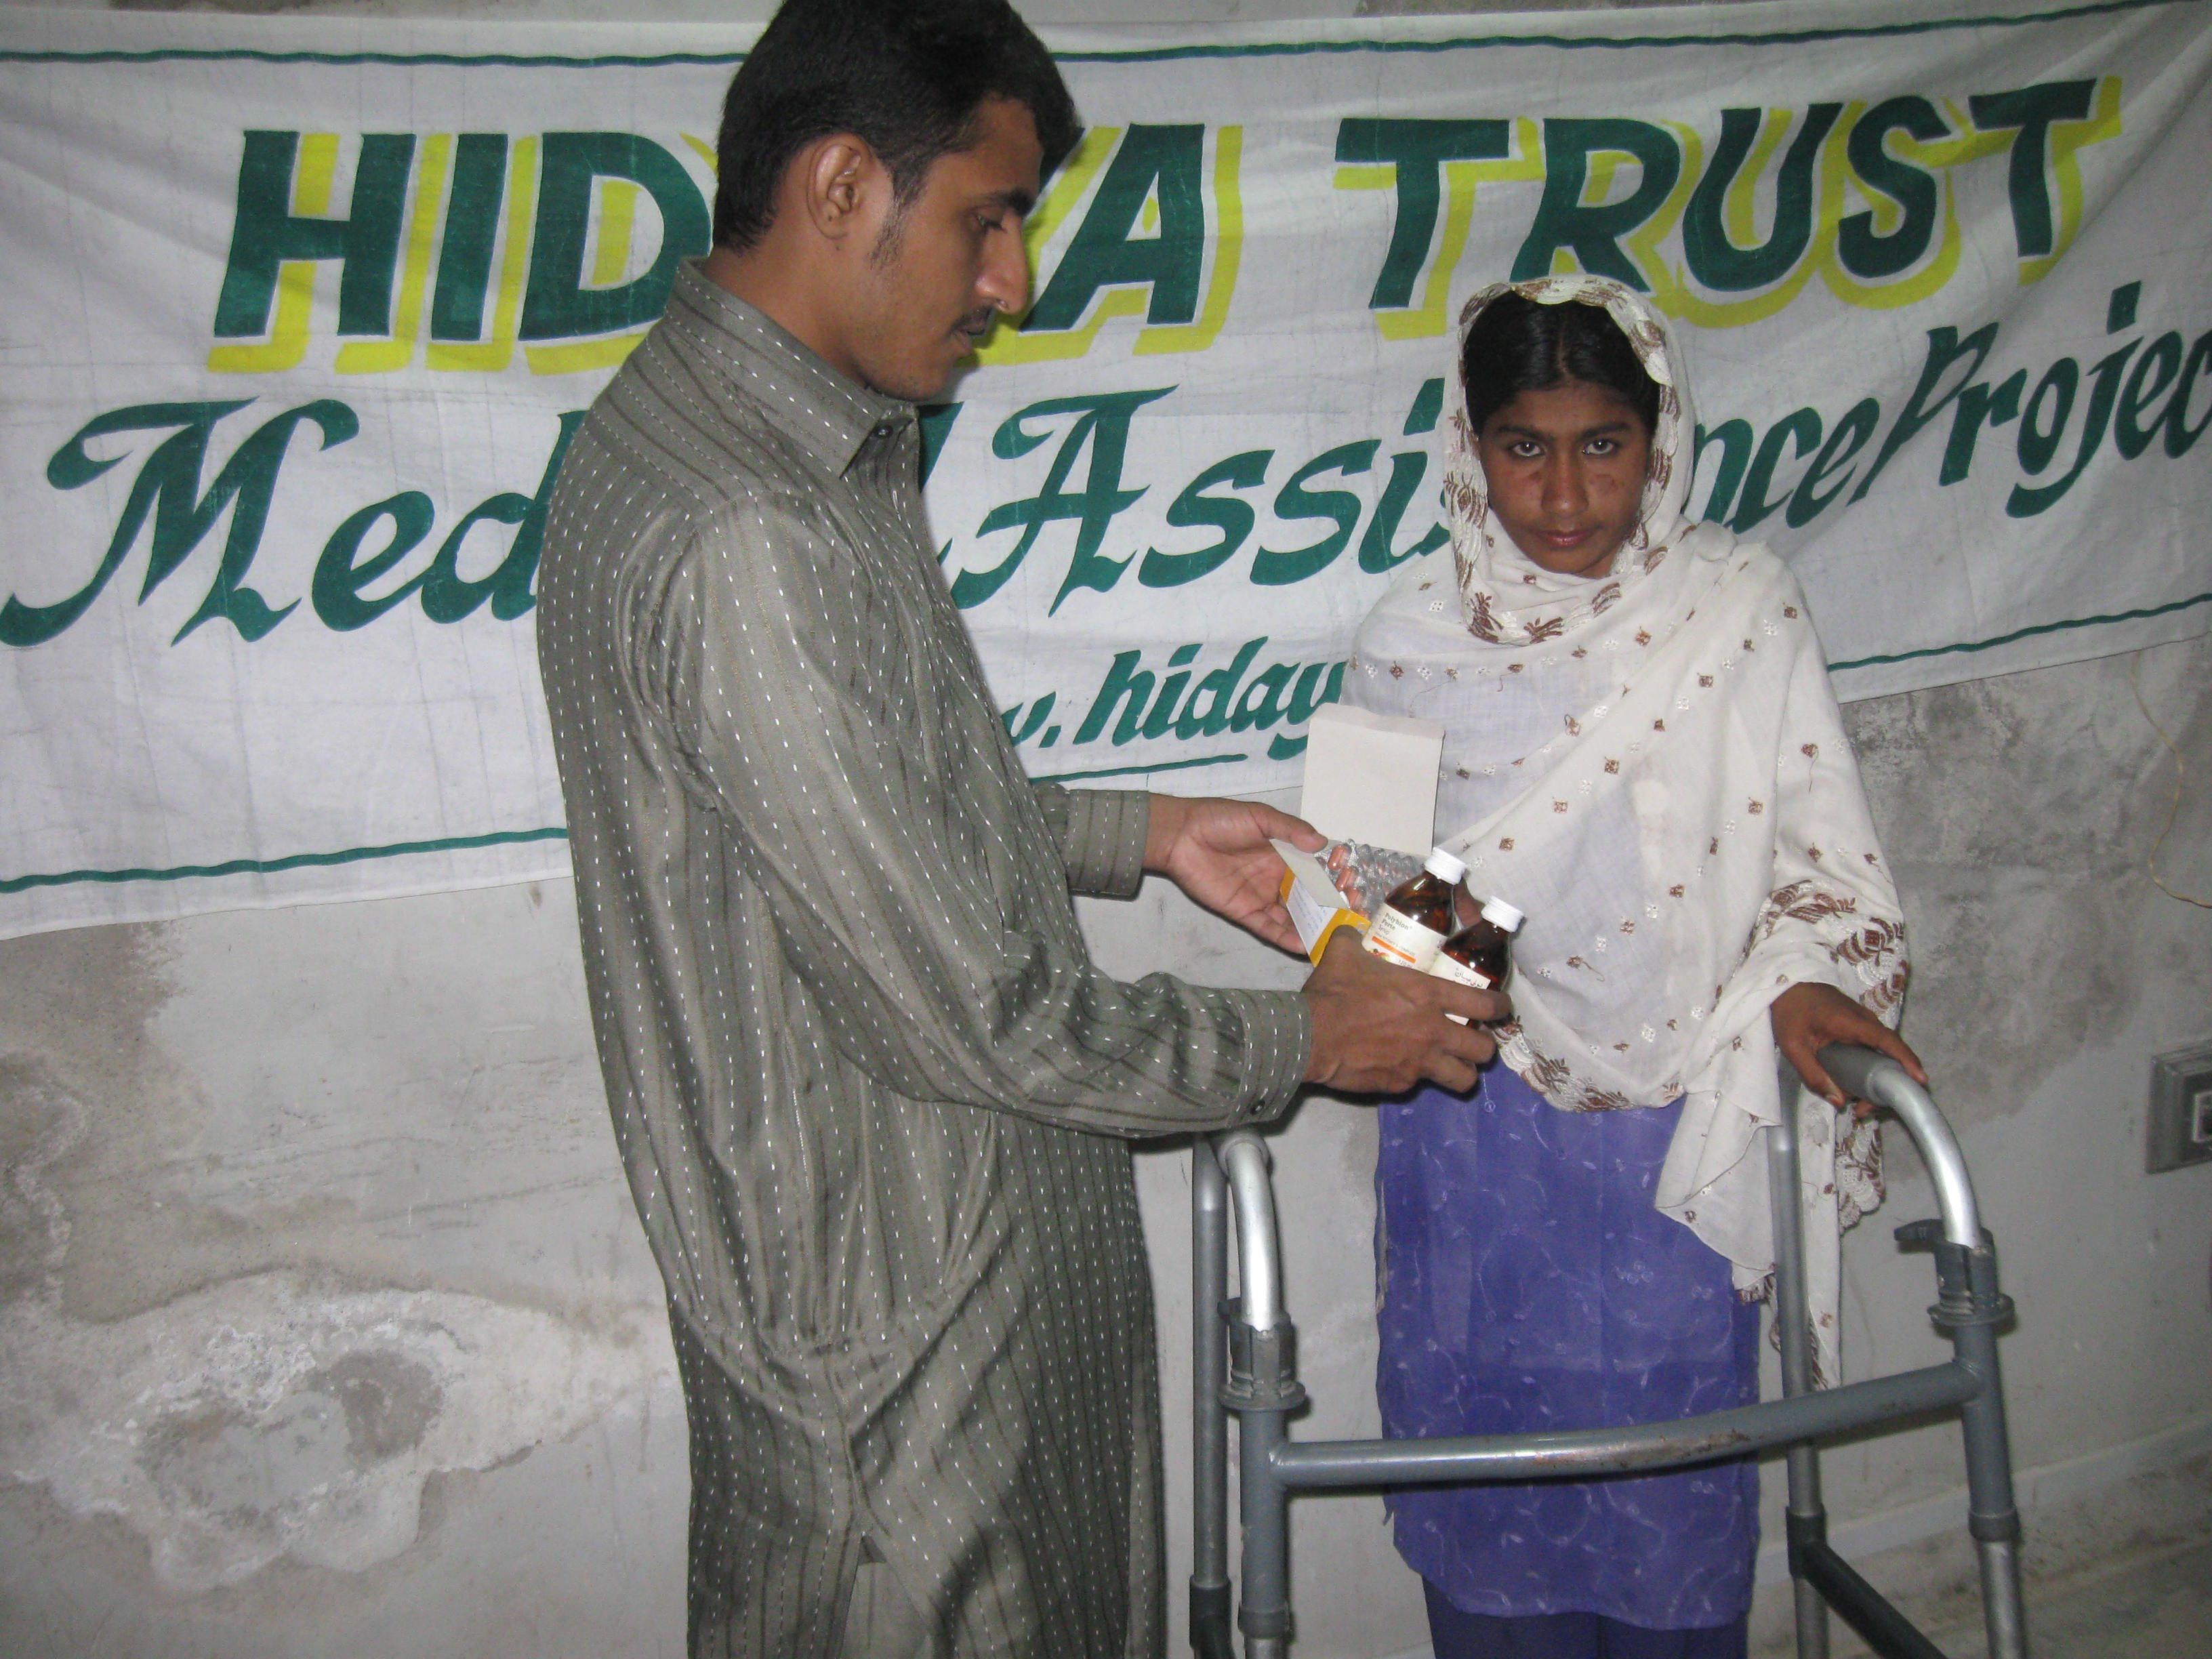 20100517_Sldo_Meda_Aqureshi_Aqureshi_Sind_Shp_Shp_Medicine_Given_To_Patient_1.jpg